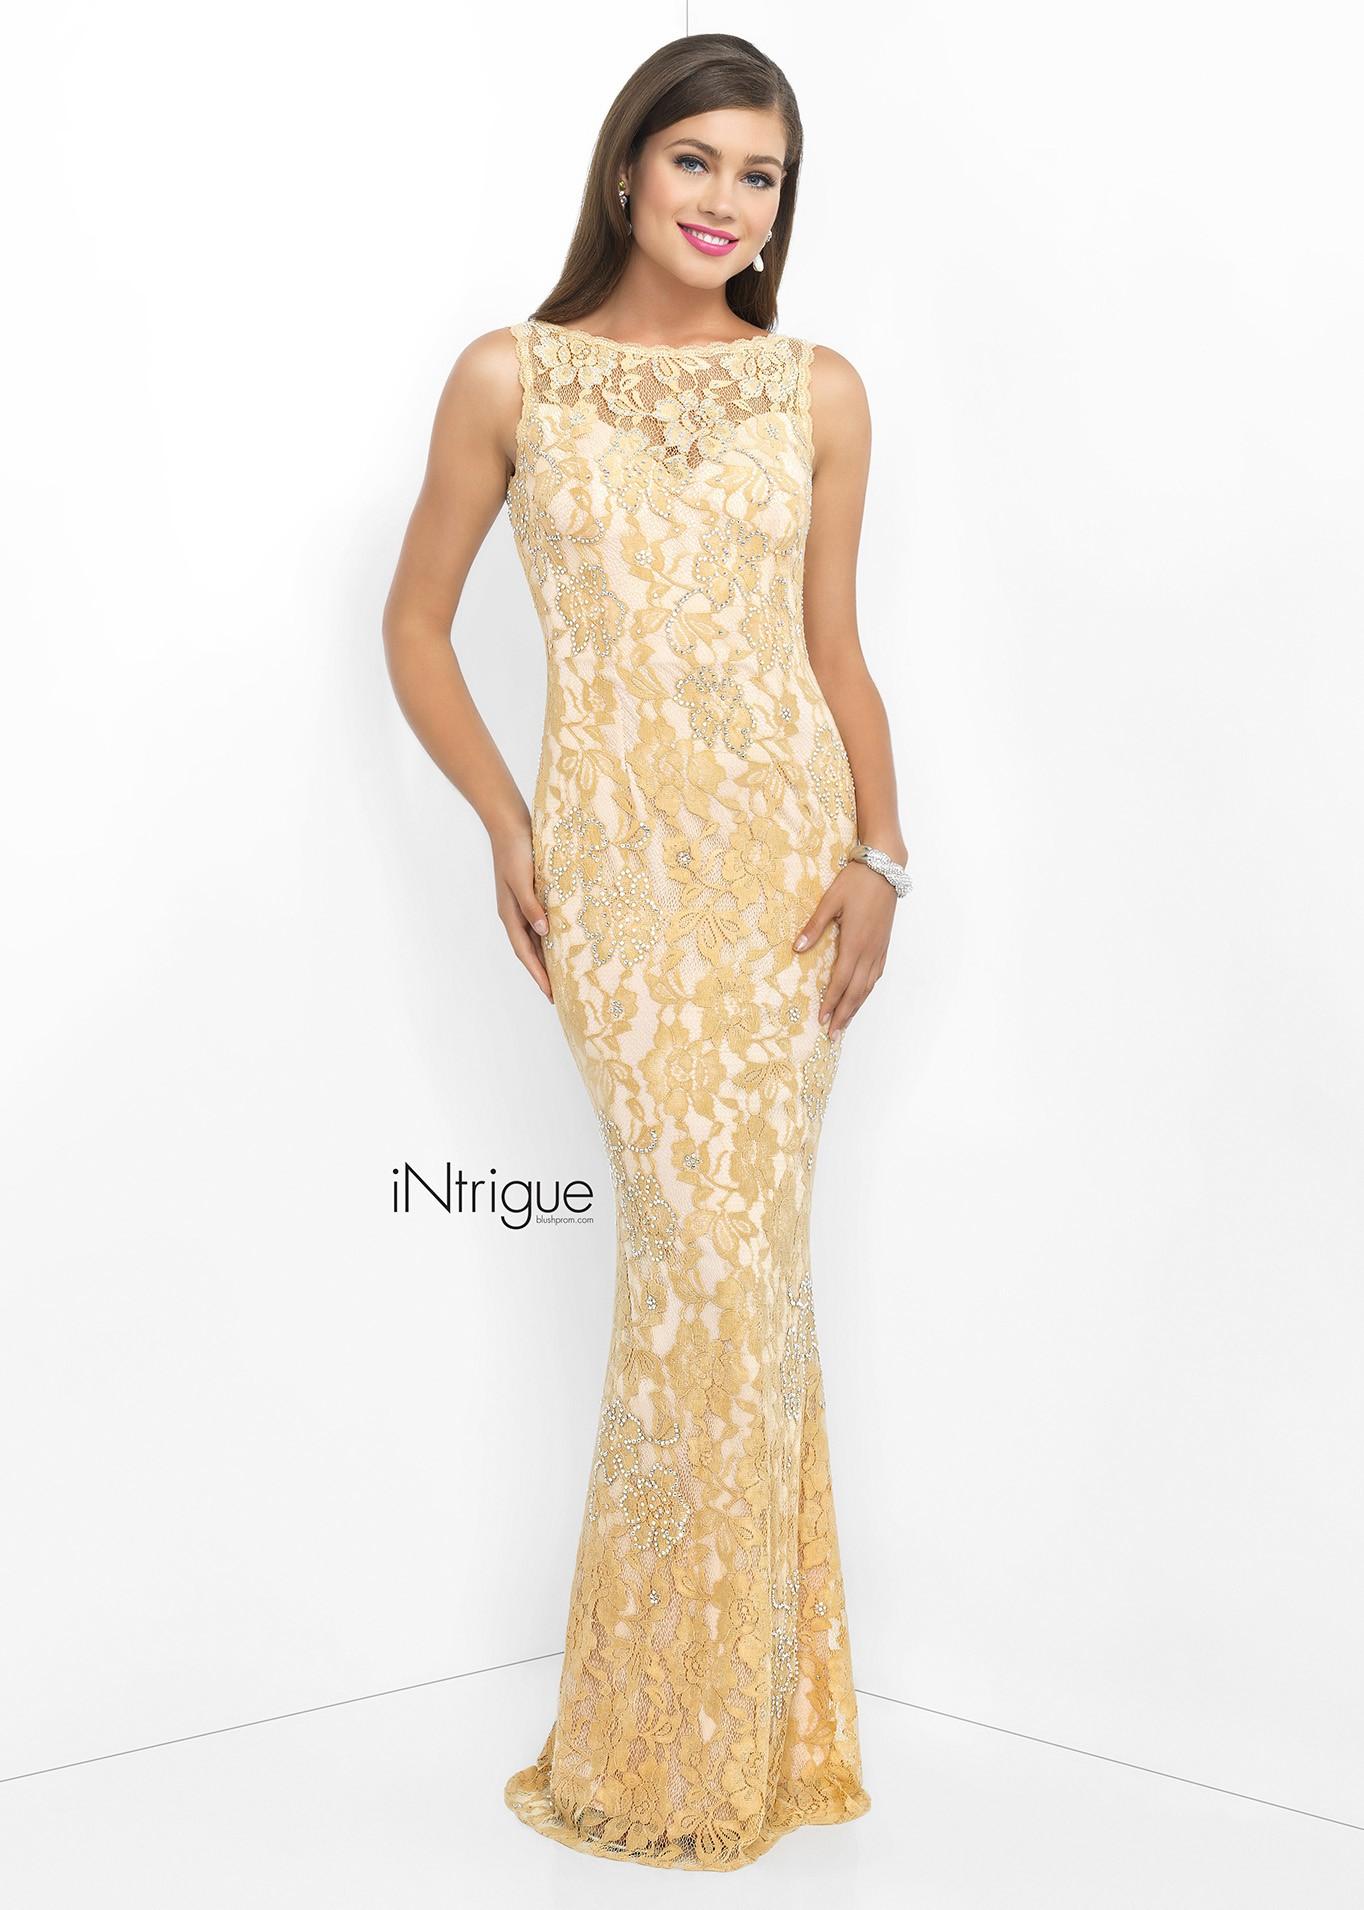 Intrigue 41 Elegant Beaded Open Back Prom Dress